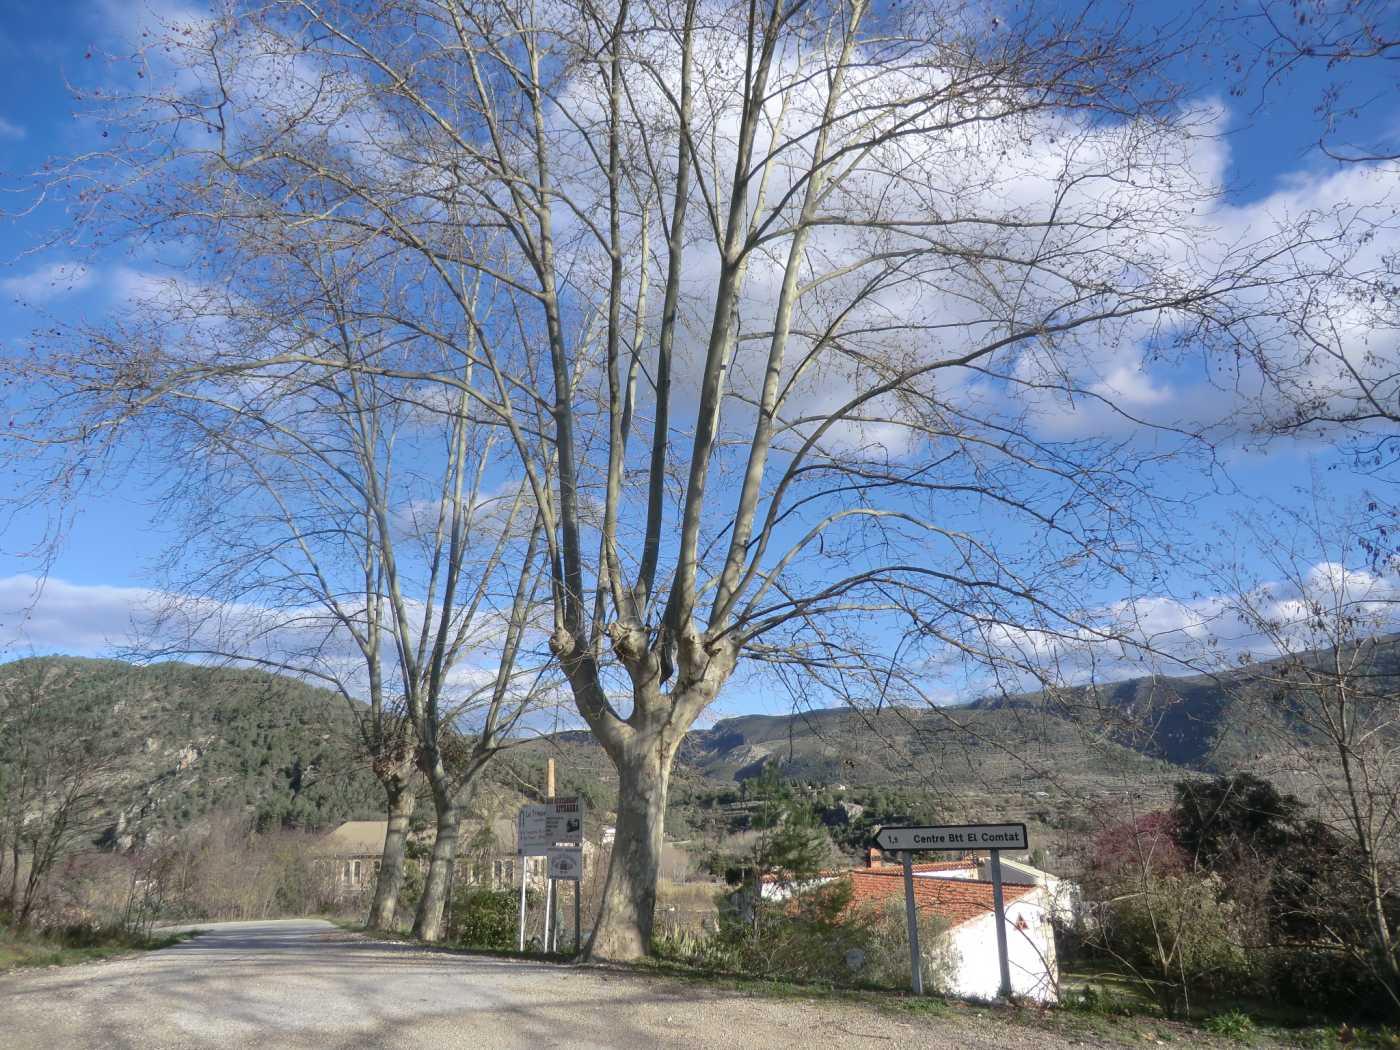 Cross-Country-MTB-Spain51